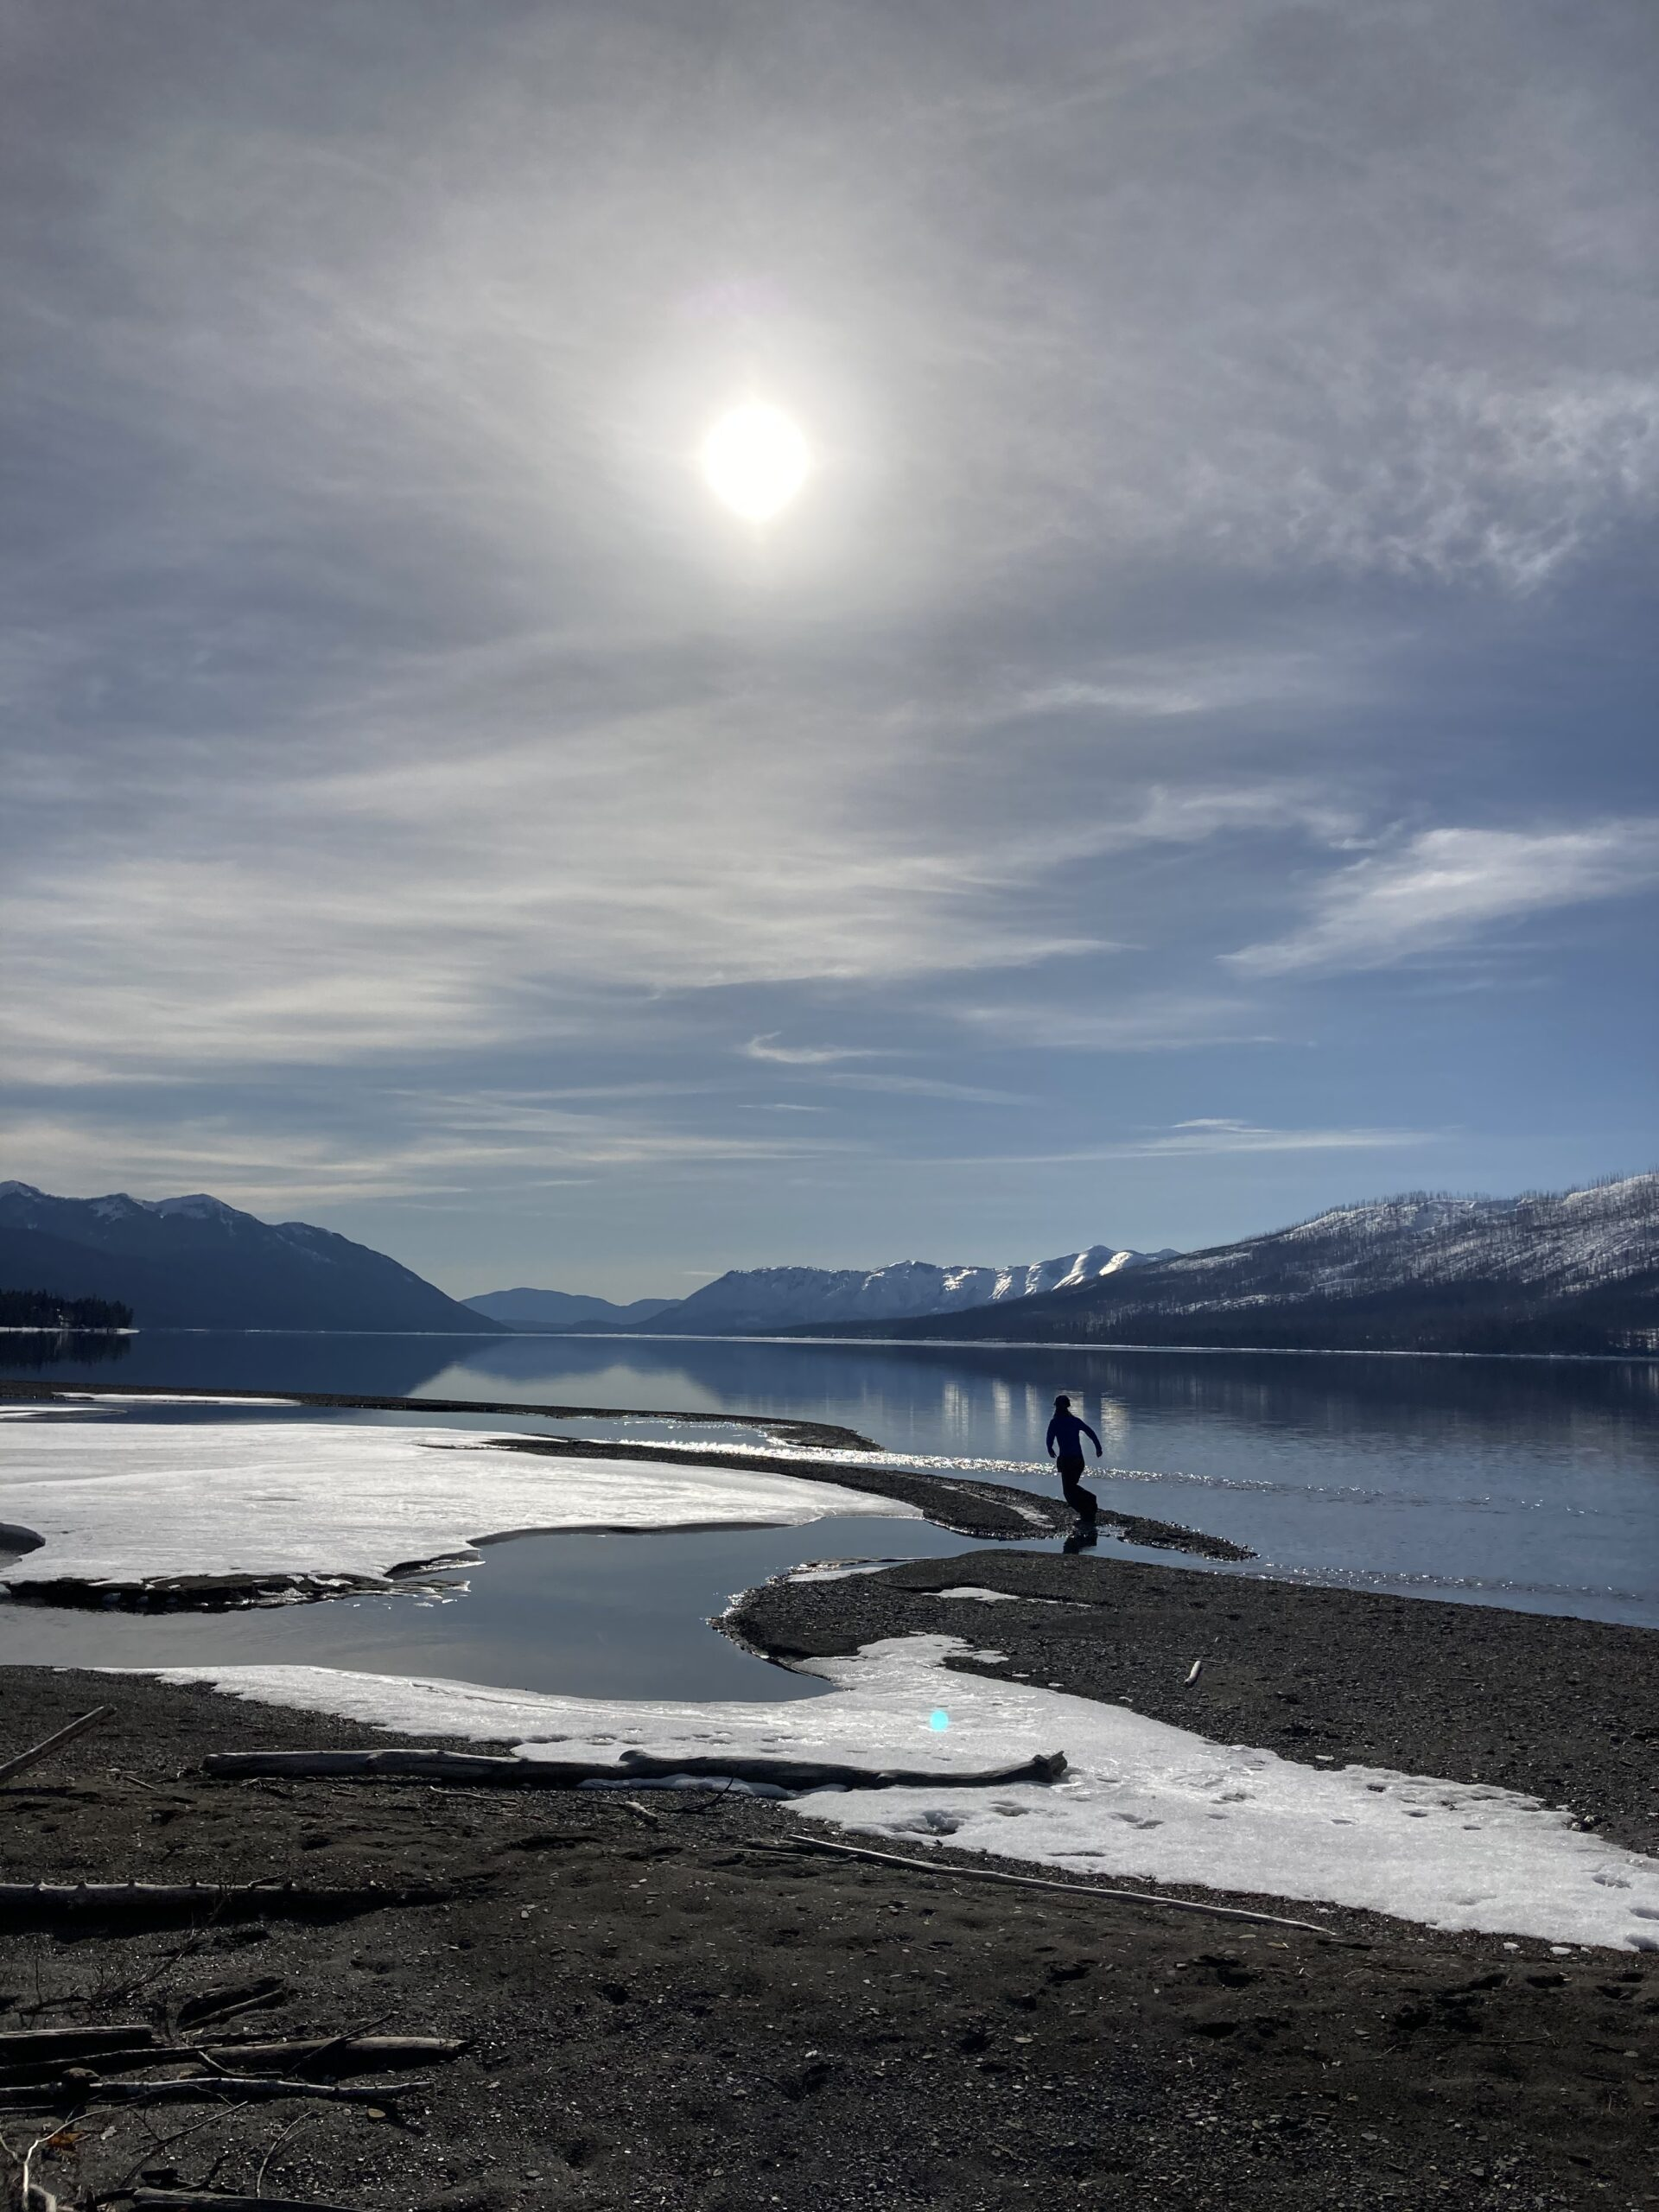 Blackfeet Nation: Glacier entrances to open on east side